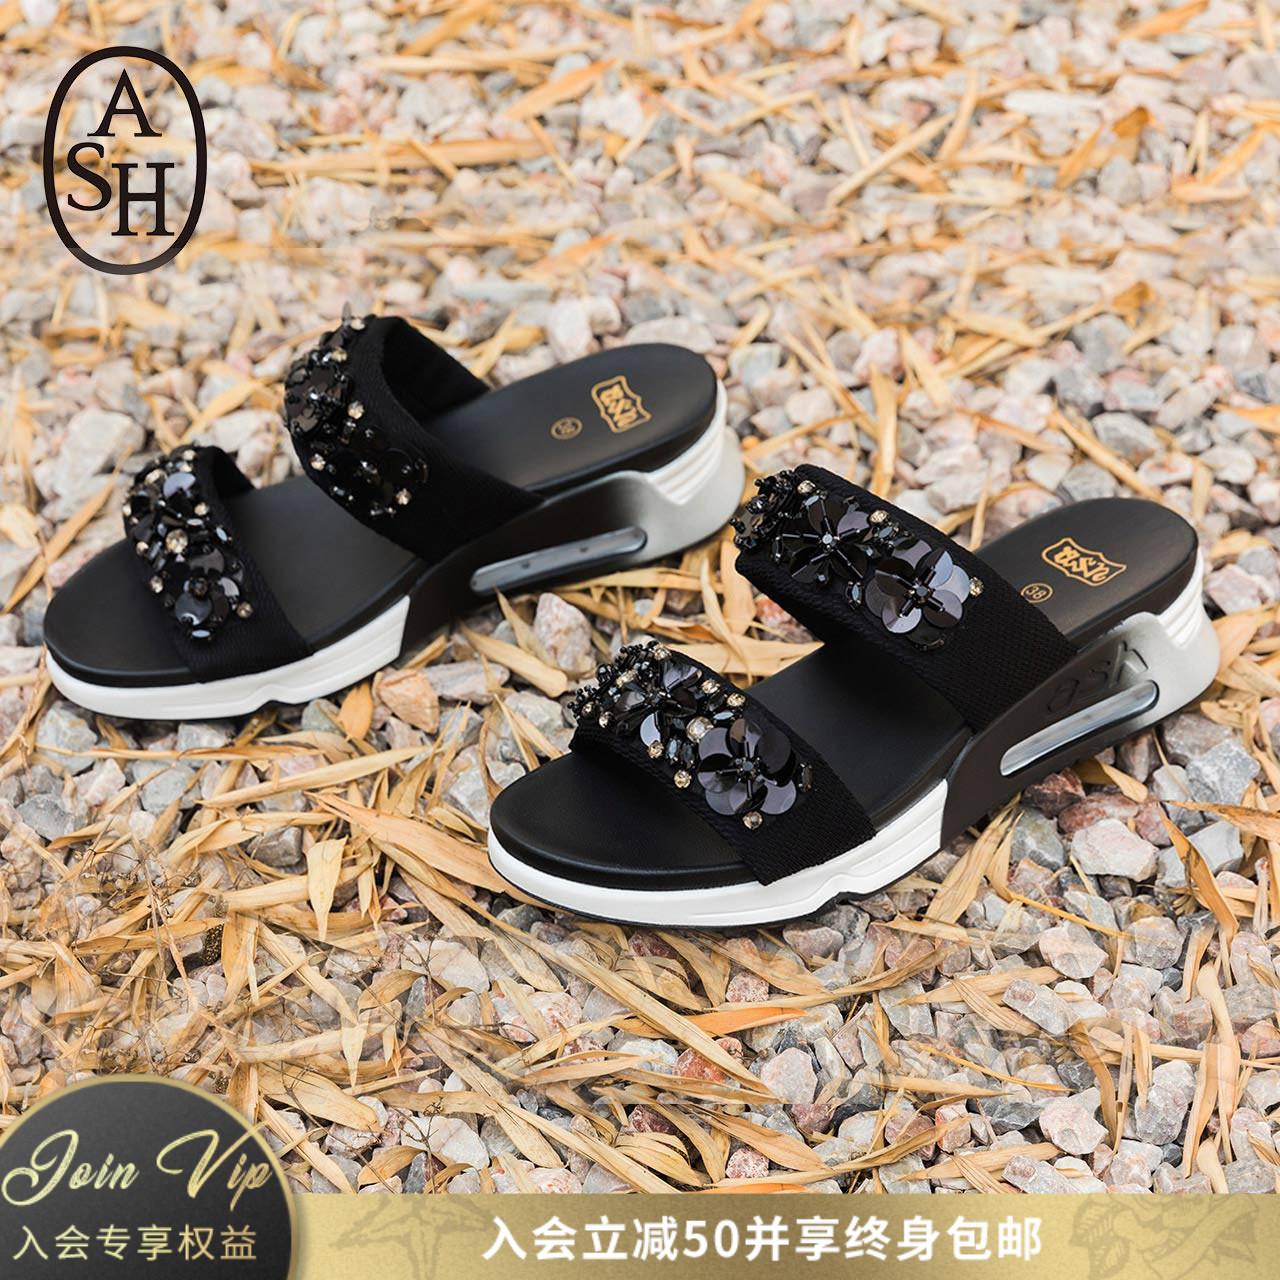 ASH凉拖2018夏季新款LILY系列花朵珠片运动气垫休闲凉鞋女式拖鞋